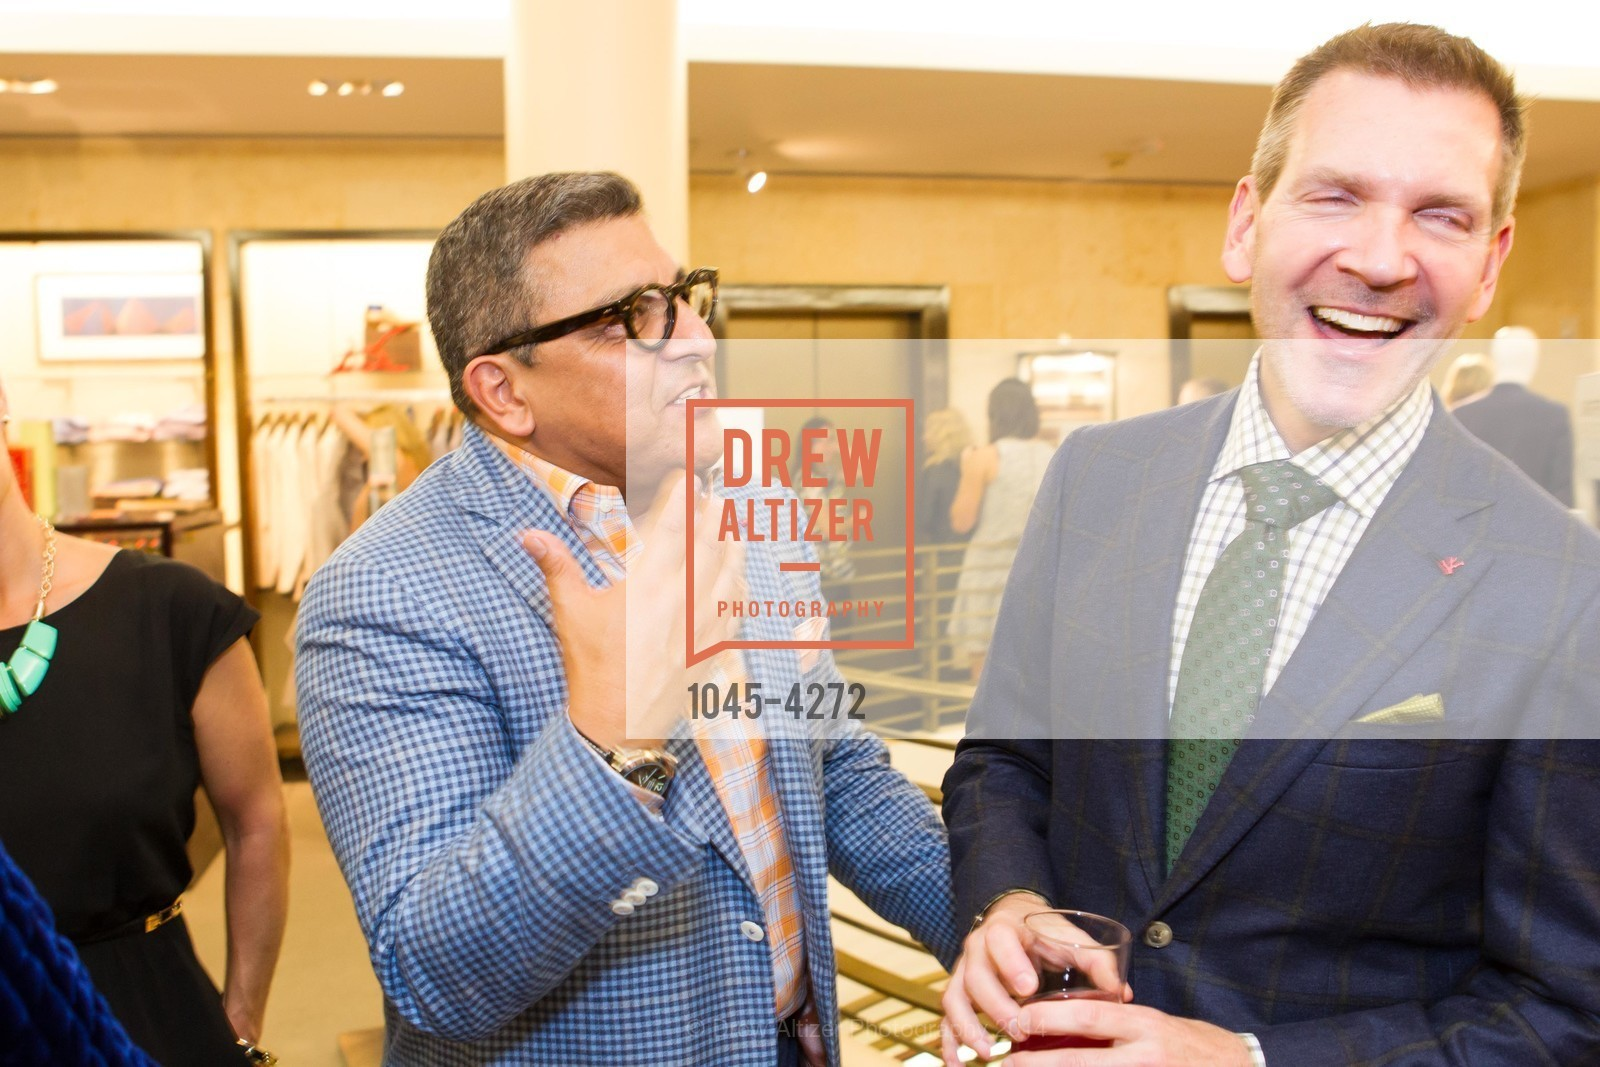 Riccardo Benavides, Eric Petsinger, Photo #1045-4272